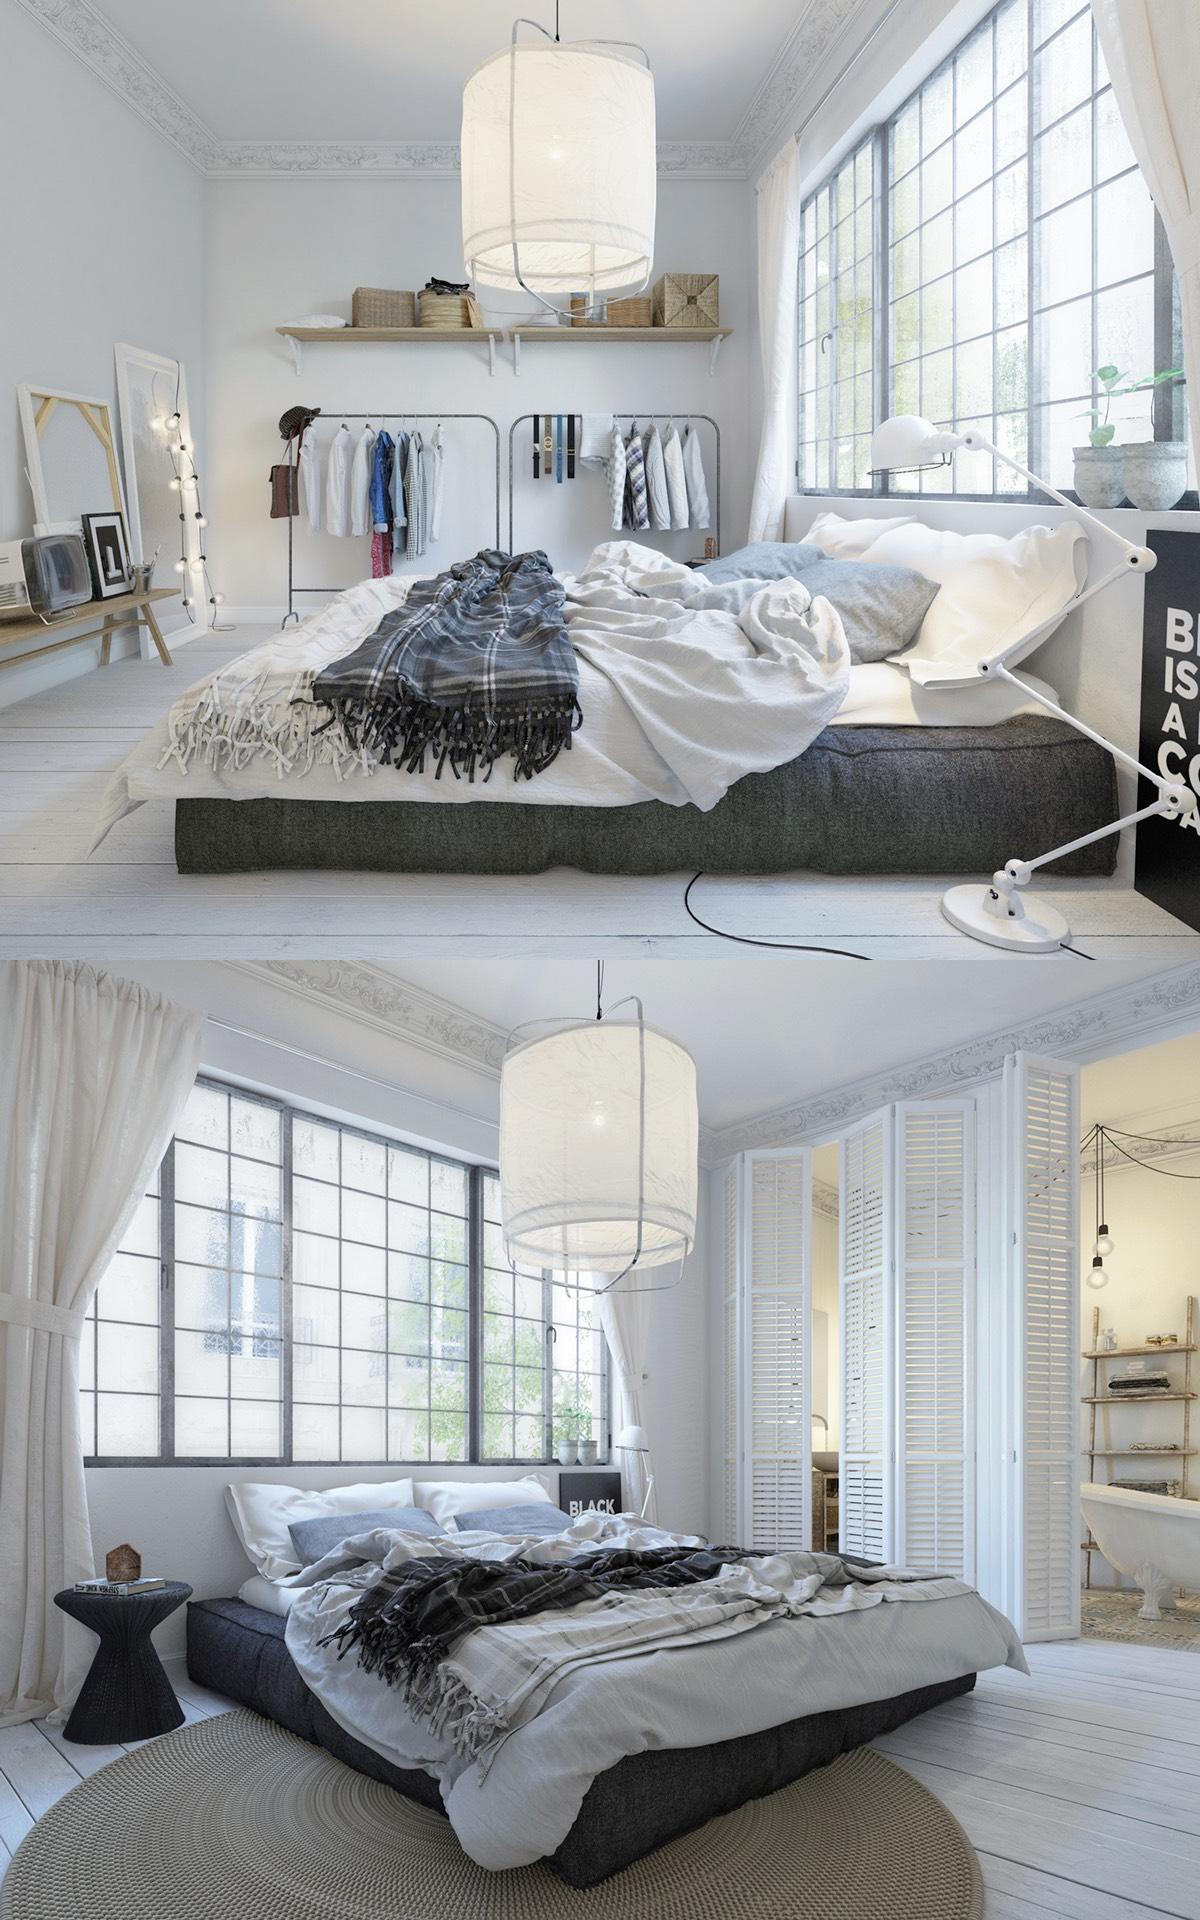 Фото спален в скандинавском стиле: идеи для вдохновения